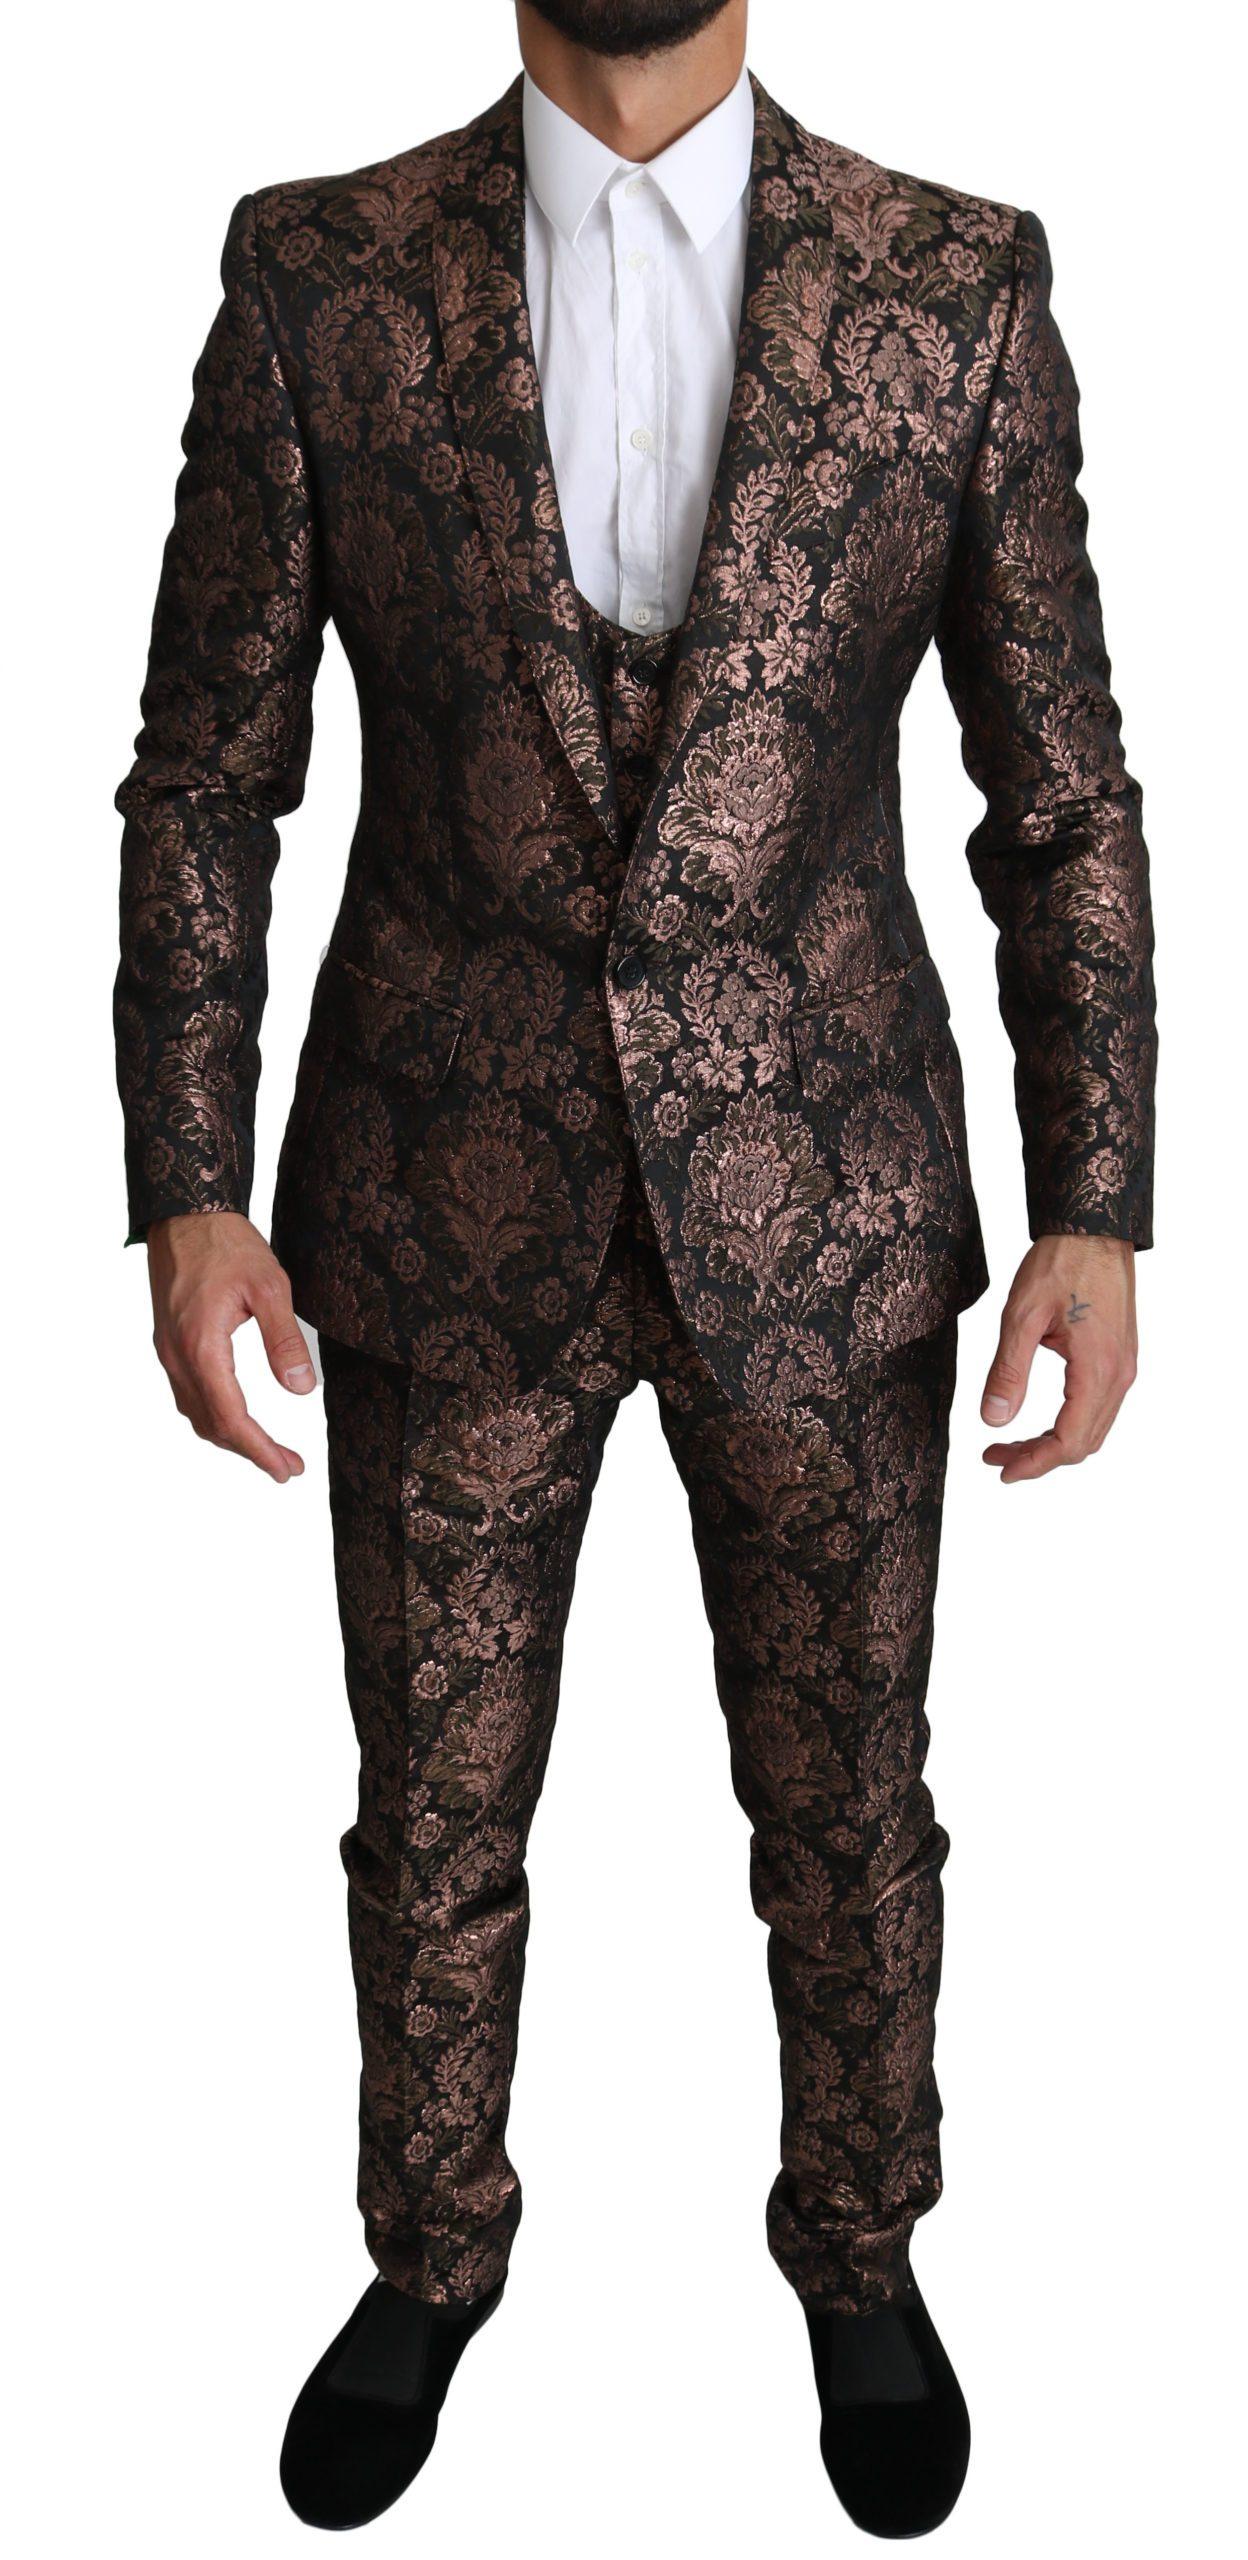 Dolce & Gabbana Men's Floral Brocade 3 Piece MARTINI Suit Rose Gold KOS1527 - IT48 | M